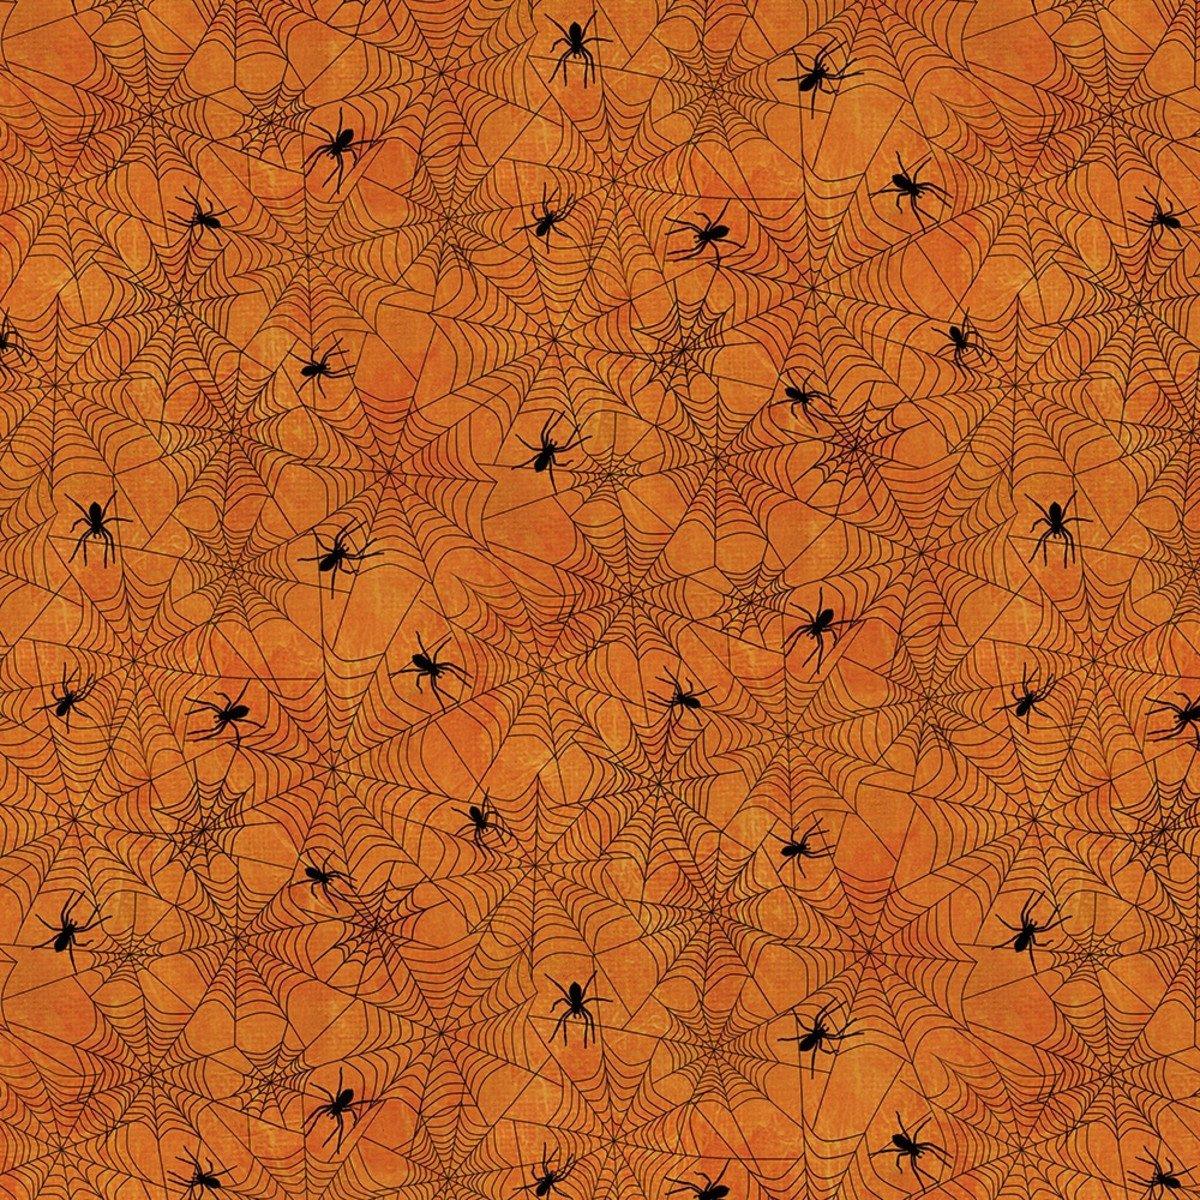 Wilmington Prints Frightful Night 3044-20509-899 Spiders & Webs Orange